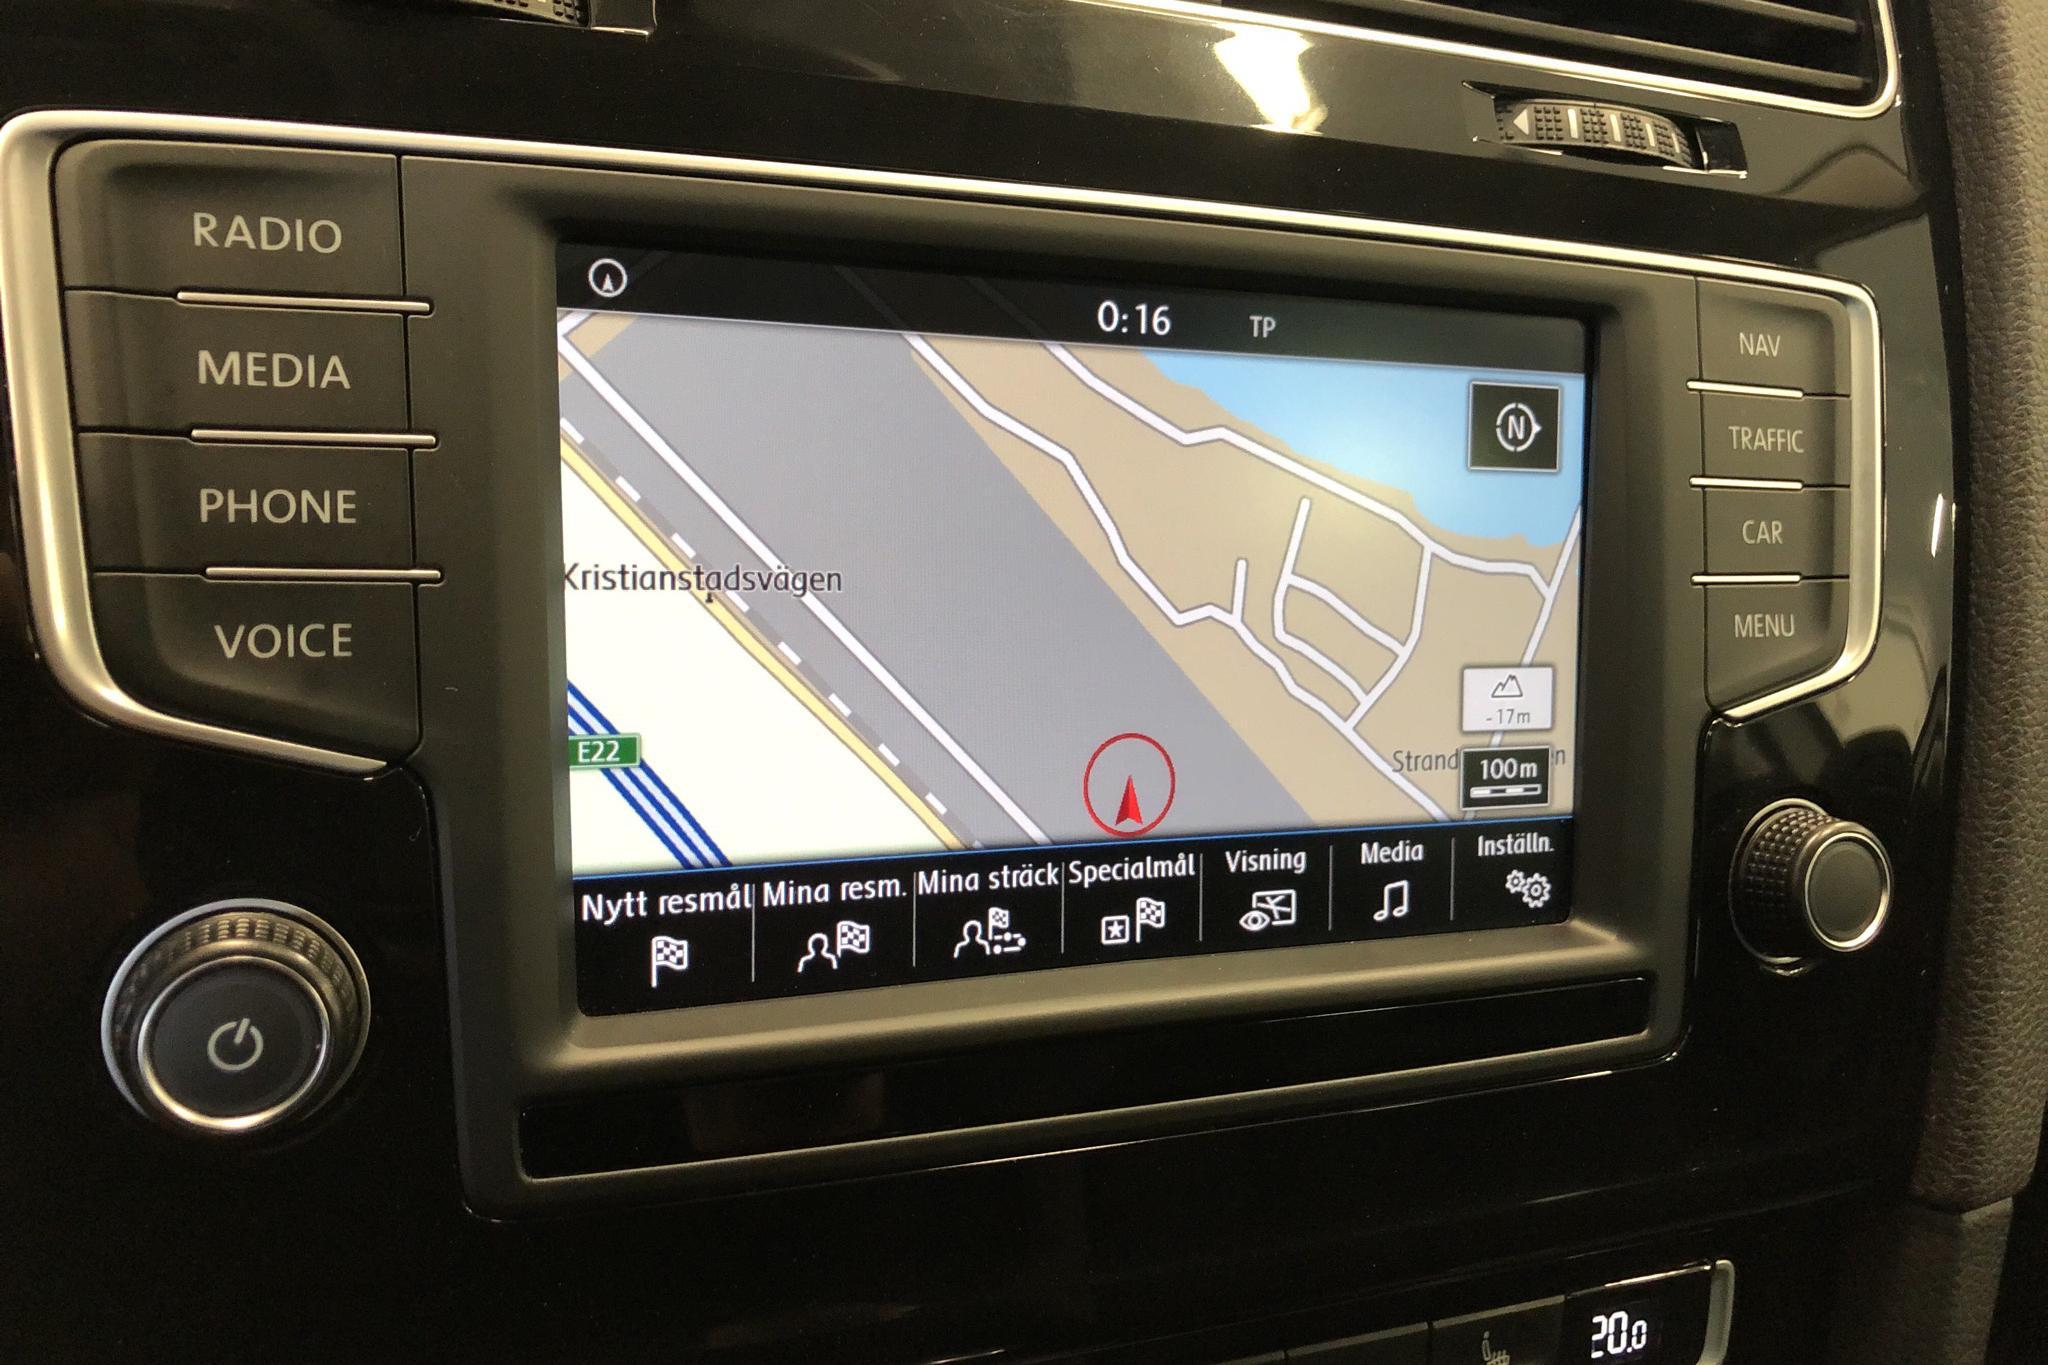 VW Golf VII 2.0 TDI BlueMotion Technology Sportscombi (150hk) - 134 740 km - Automatic - white - 2016